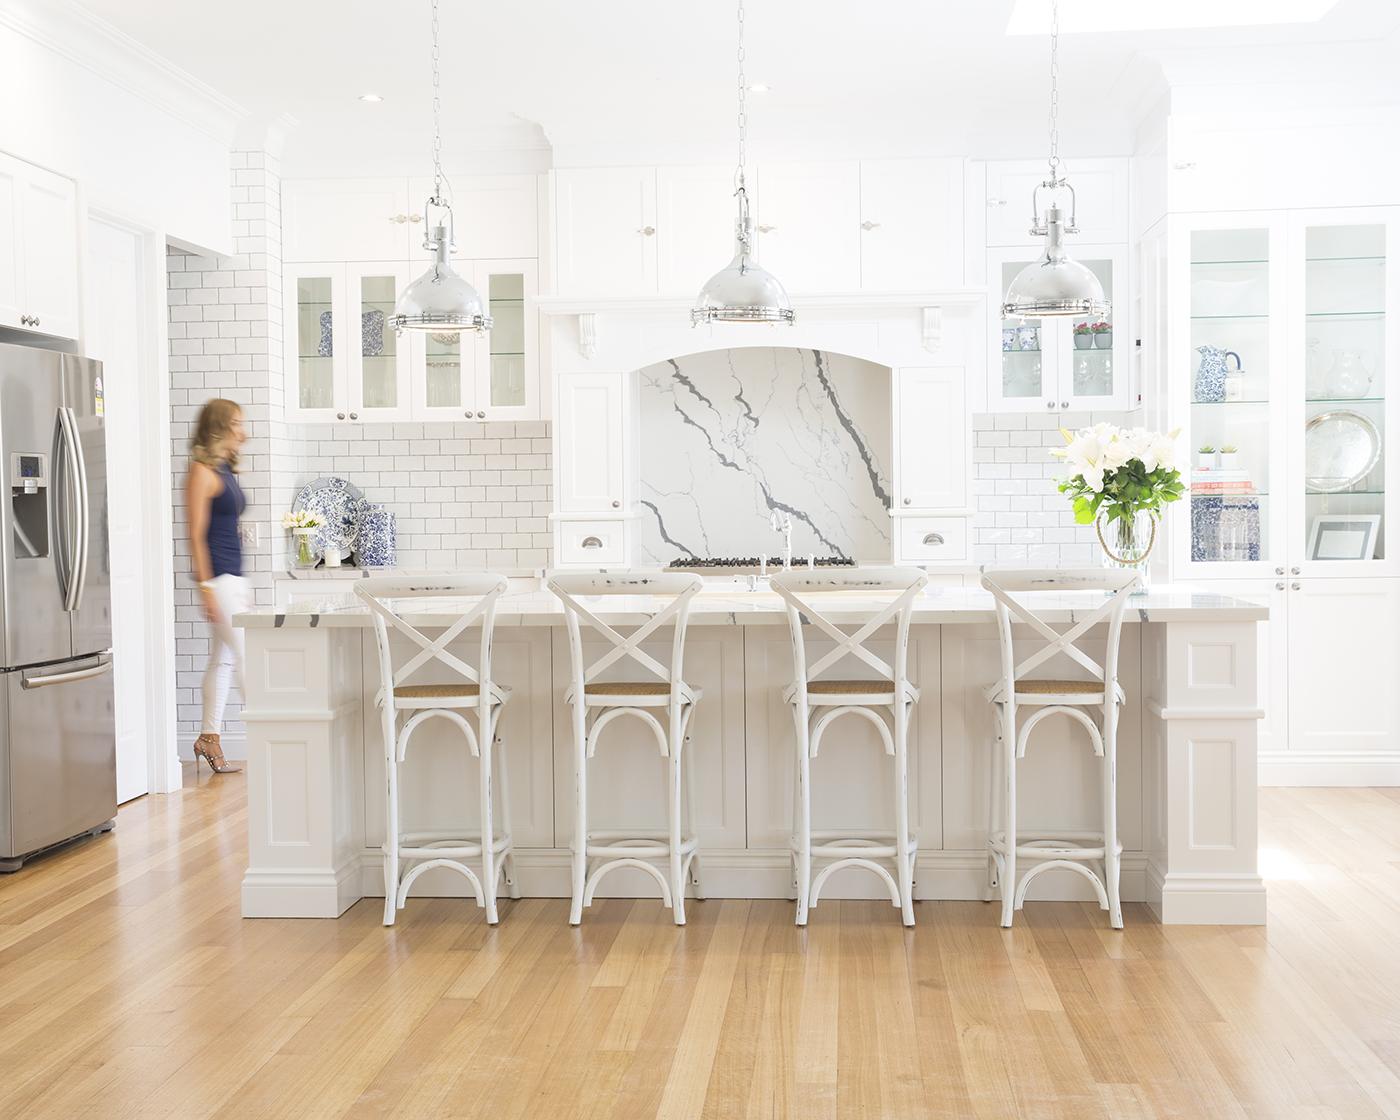 Interior design   Design by Danni  /  Photography   Rikki Lancaster   /  Cabinet makers   Juro Design